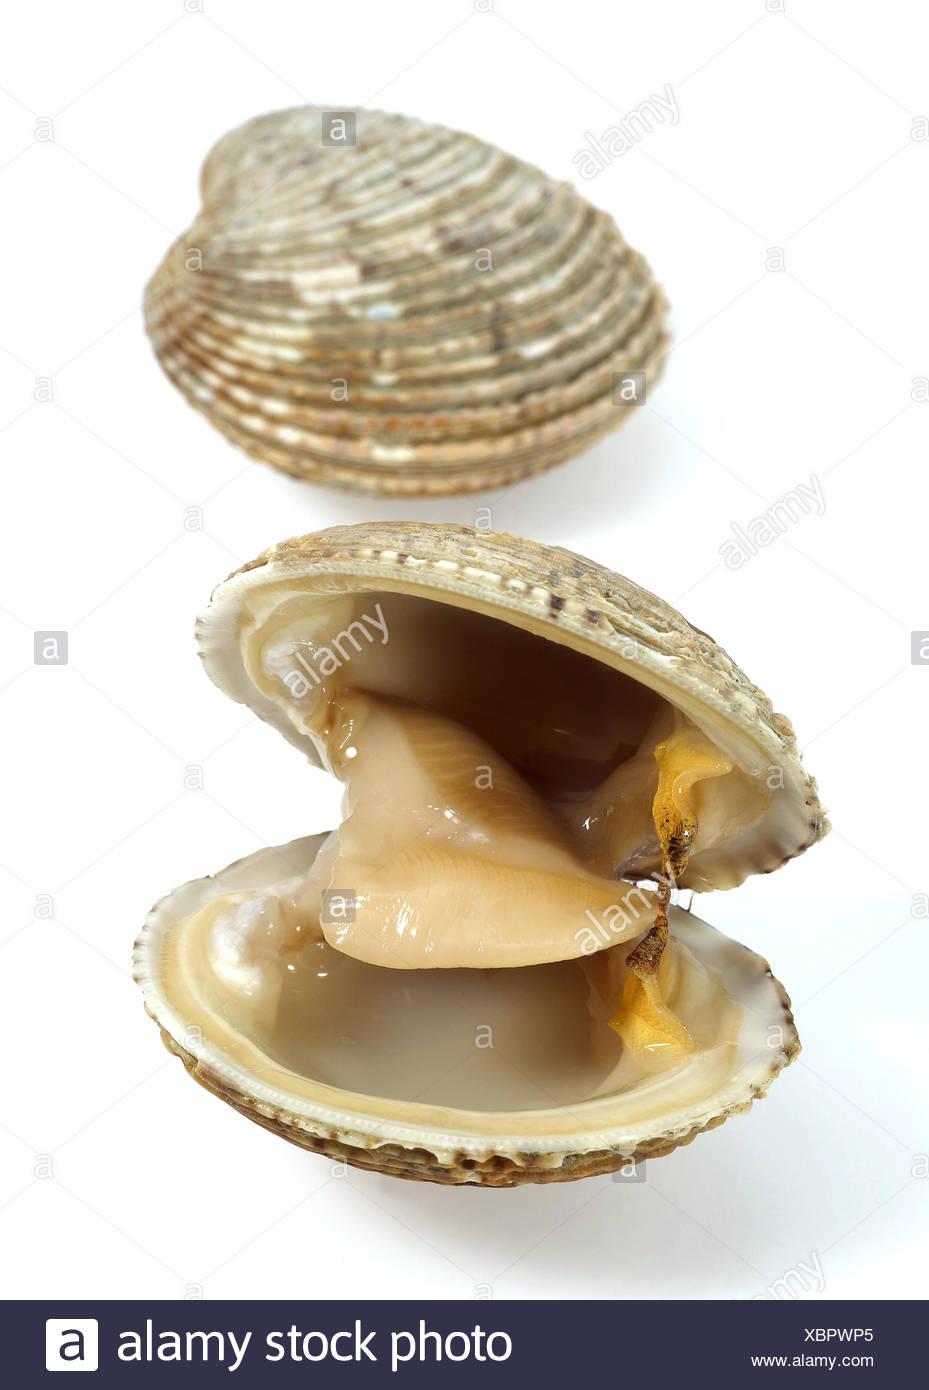 Clams, venus verrucosa, Shells against White Background - Stock Image